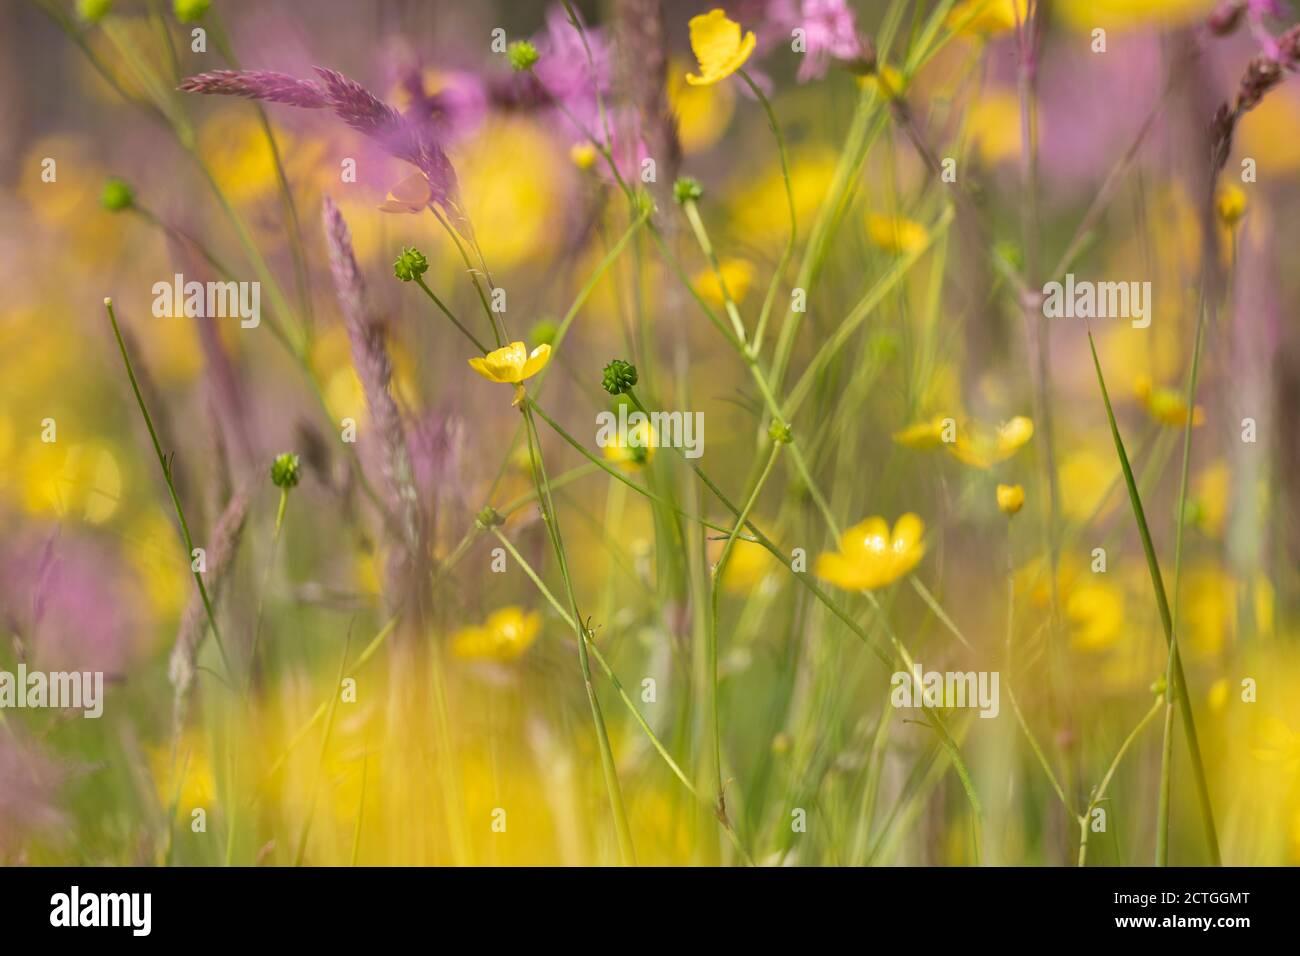 Wet flower-rich meadow, Kielder Water & Forest Park, Northumberland, UK Stock Photo